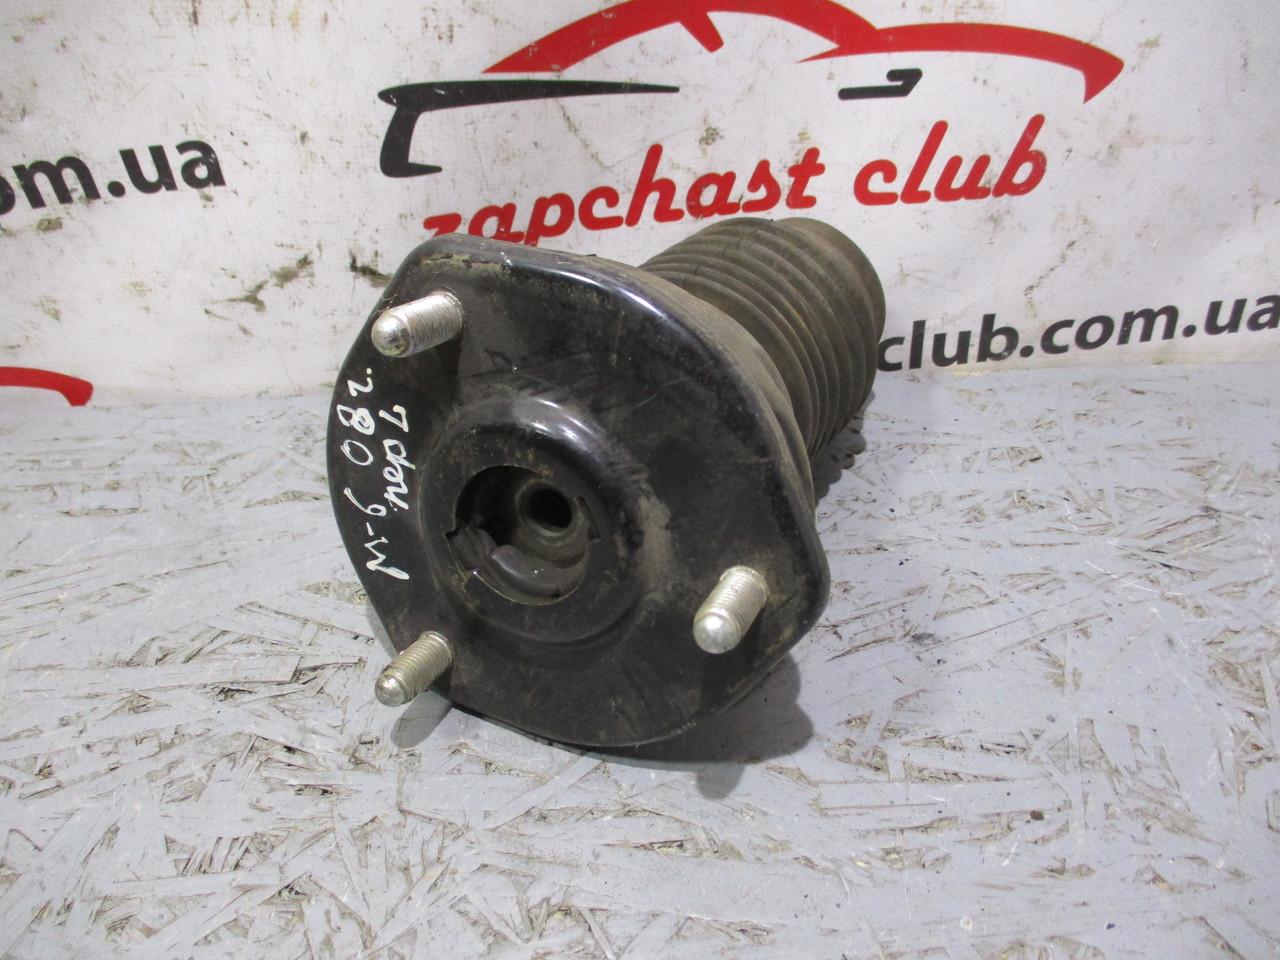 Опора амортизатора переднего Mazda 6 GH GS1D-34-380A, GS1D-34-380B, GS1D-34-380C с пыльником GS1D-34-012A